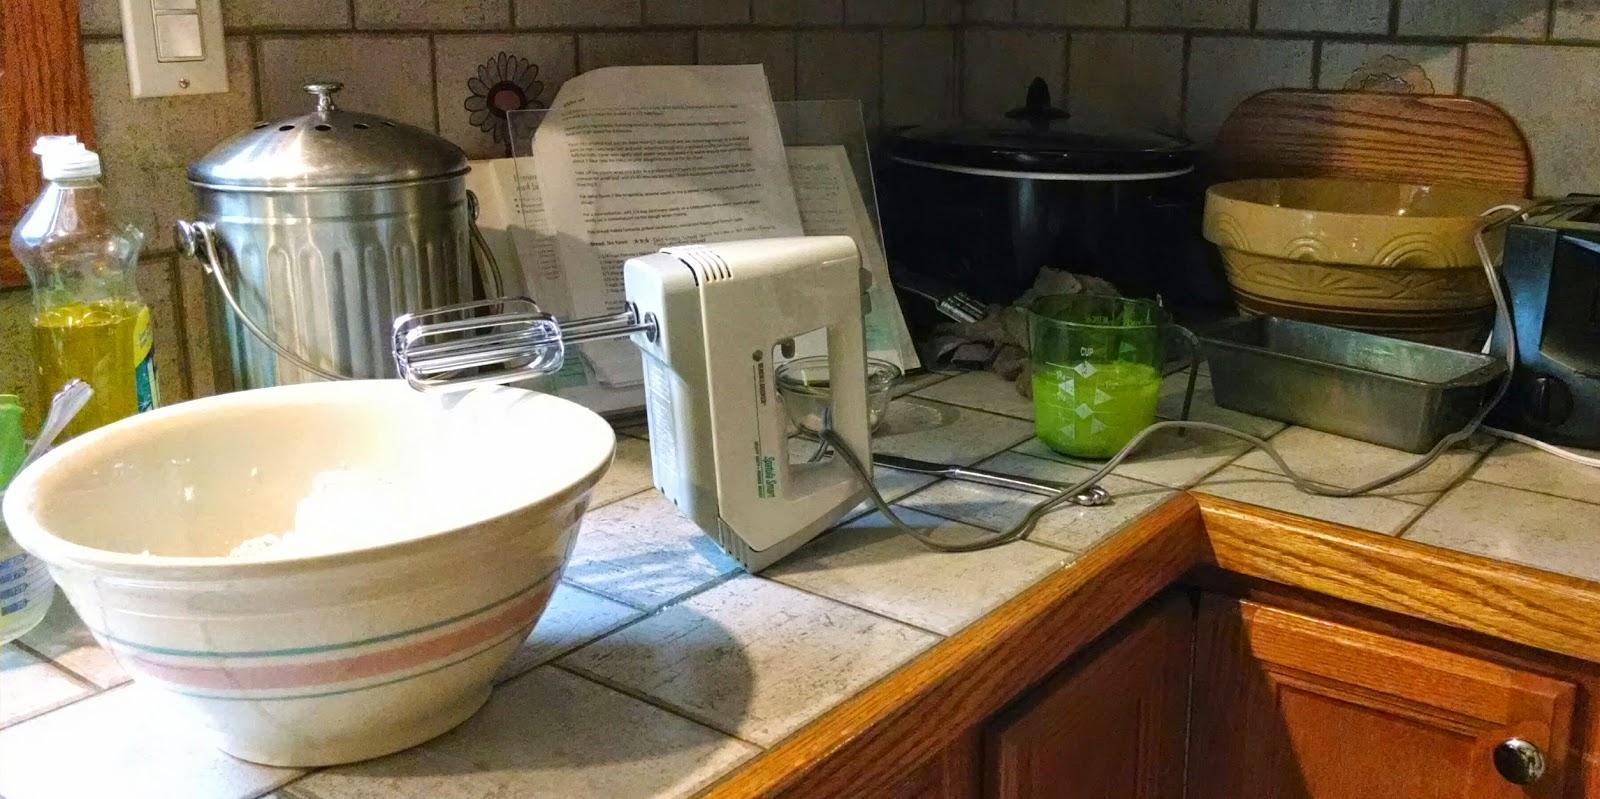 bowl, mixer, bread pan